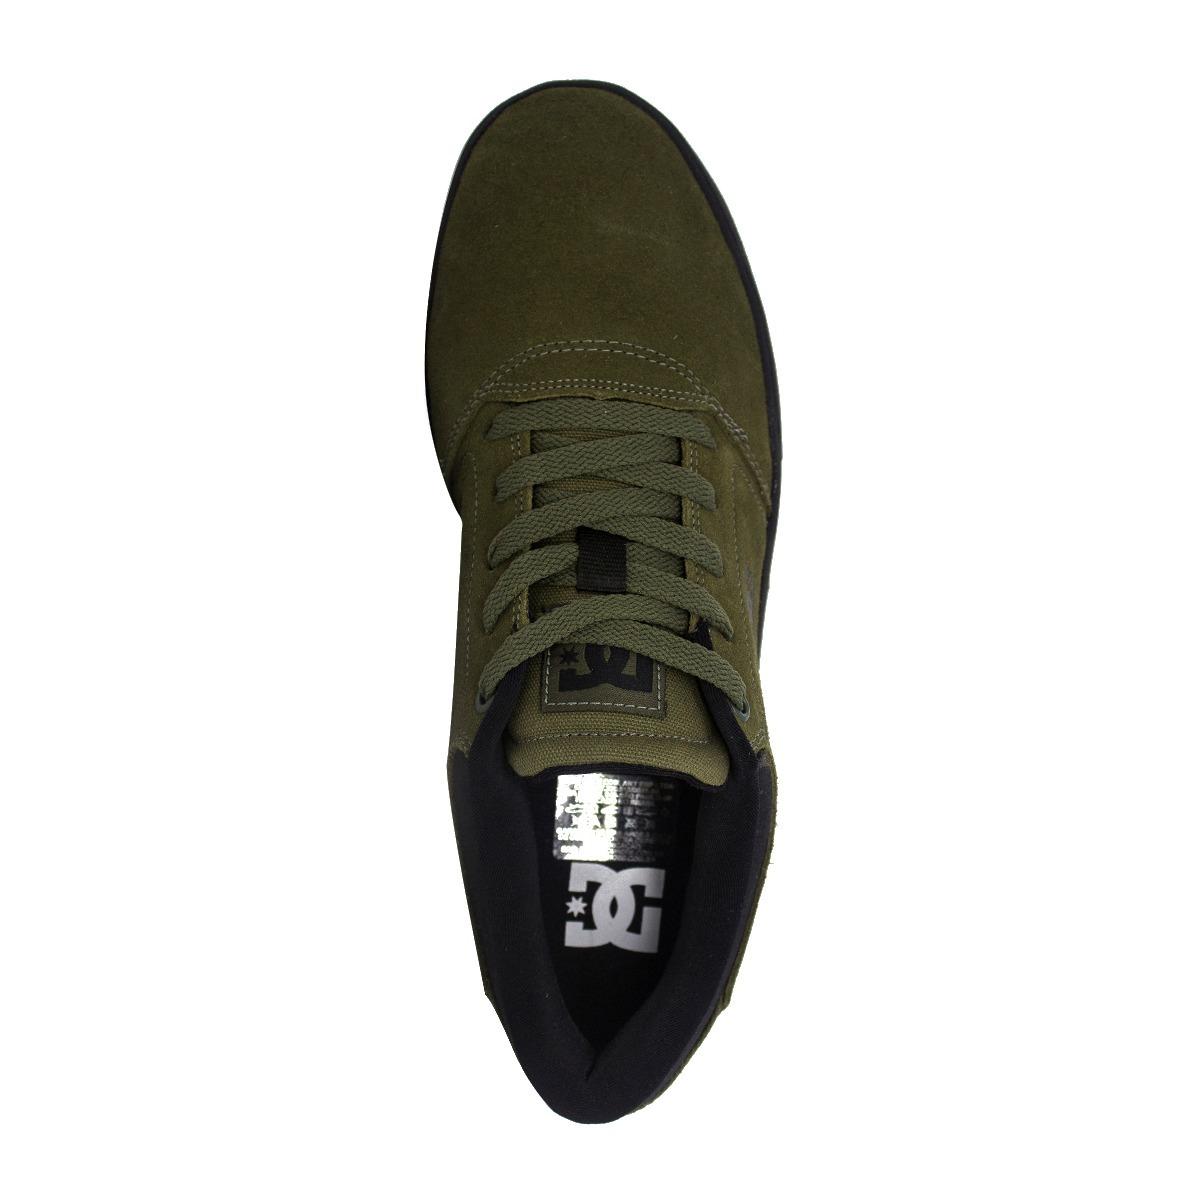 tenis dc shoes crisis la olive original frete gratis. Carregando zoom. 69edc97b76d0e